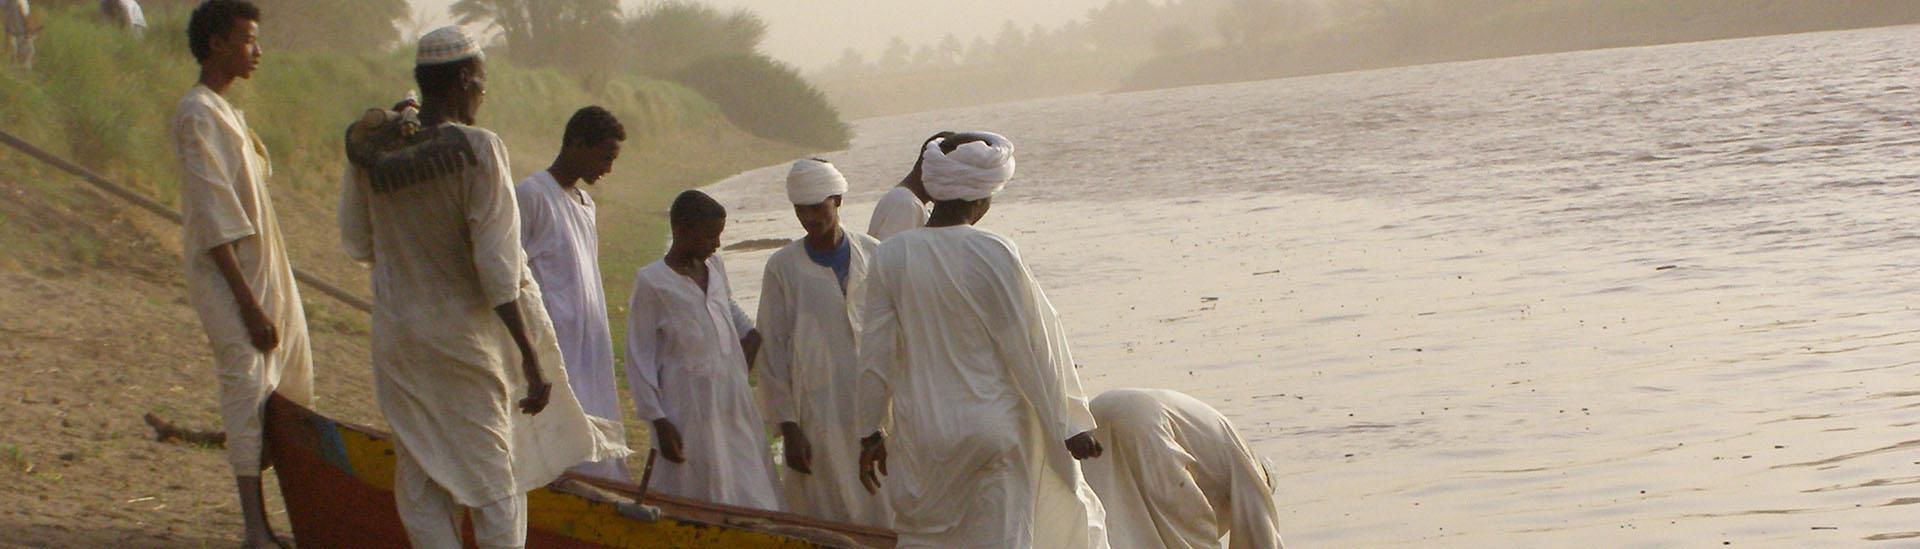 Baner filmu 'Abu Haraz'